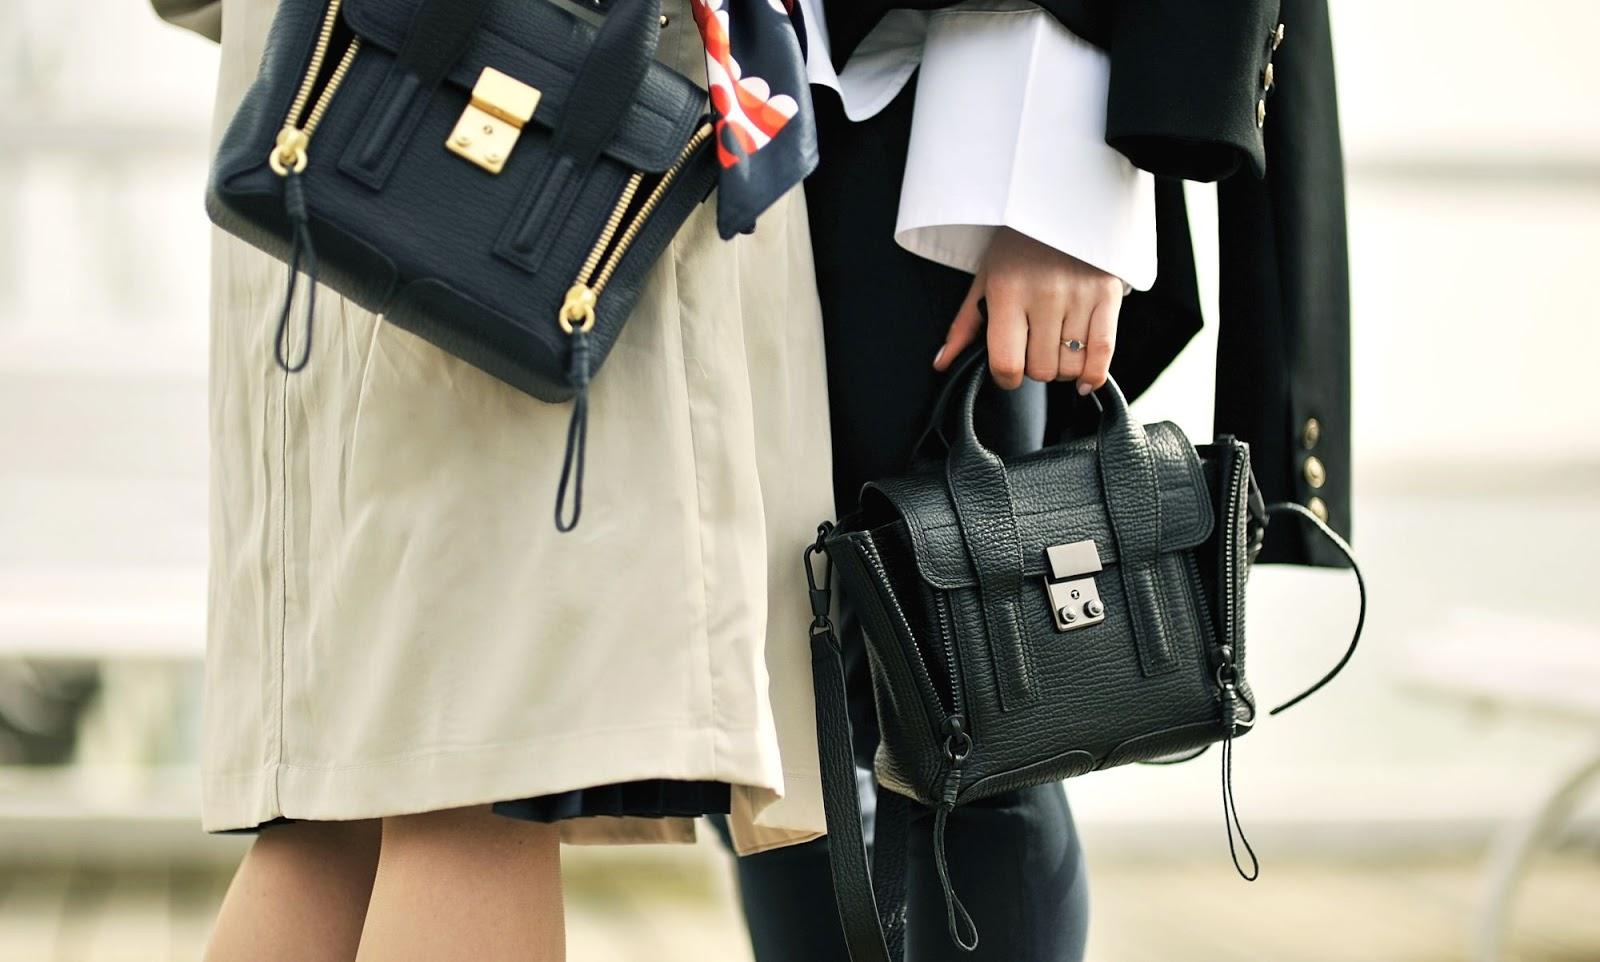 zakupy na shopbop | skorzana torebka | modne torebki na wiosne